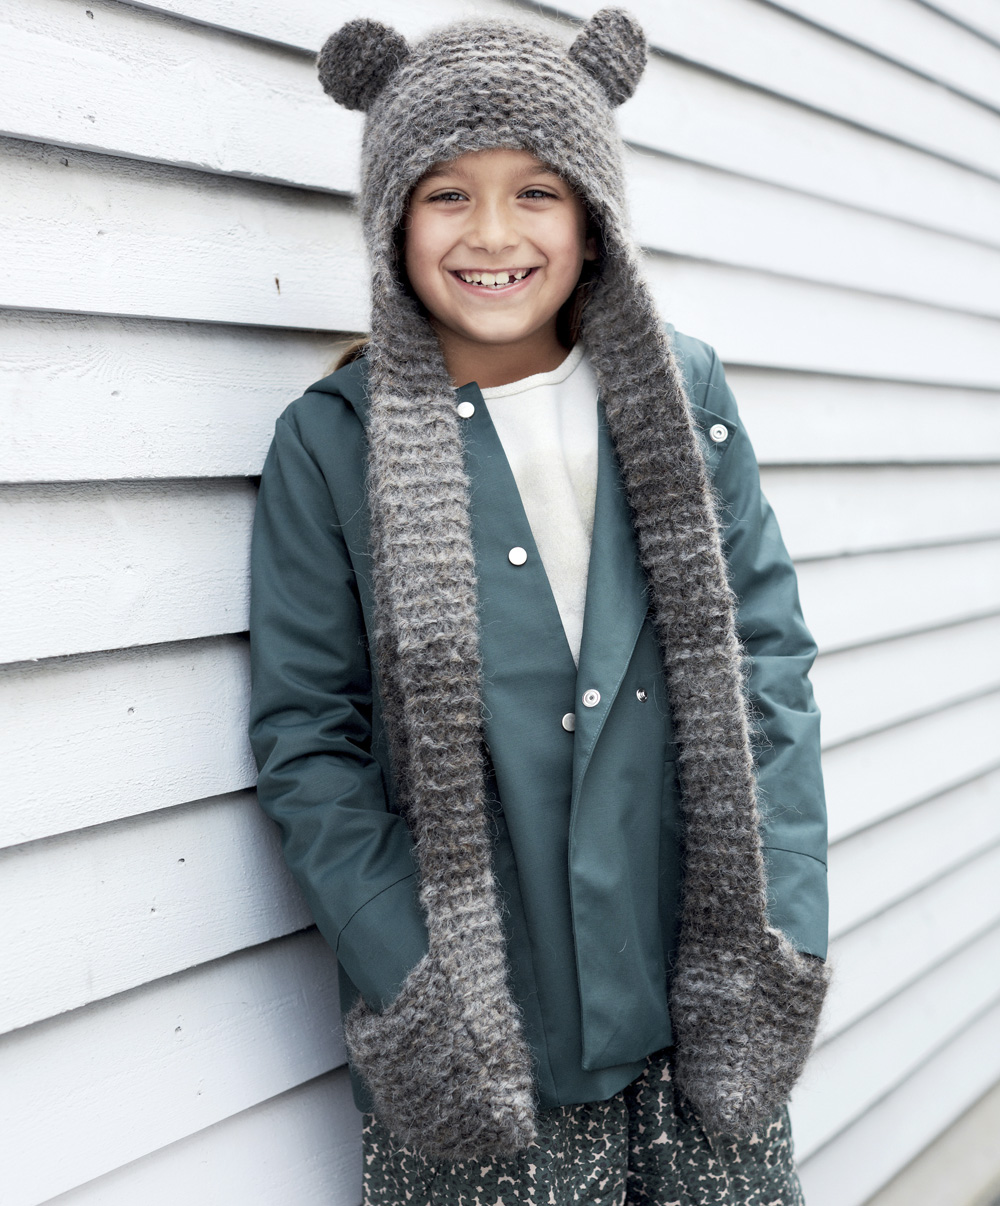 Шапка-шарф с ушками